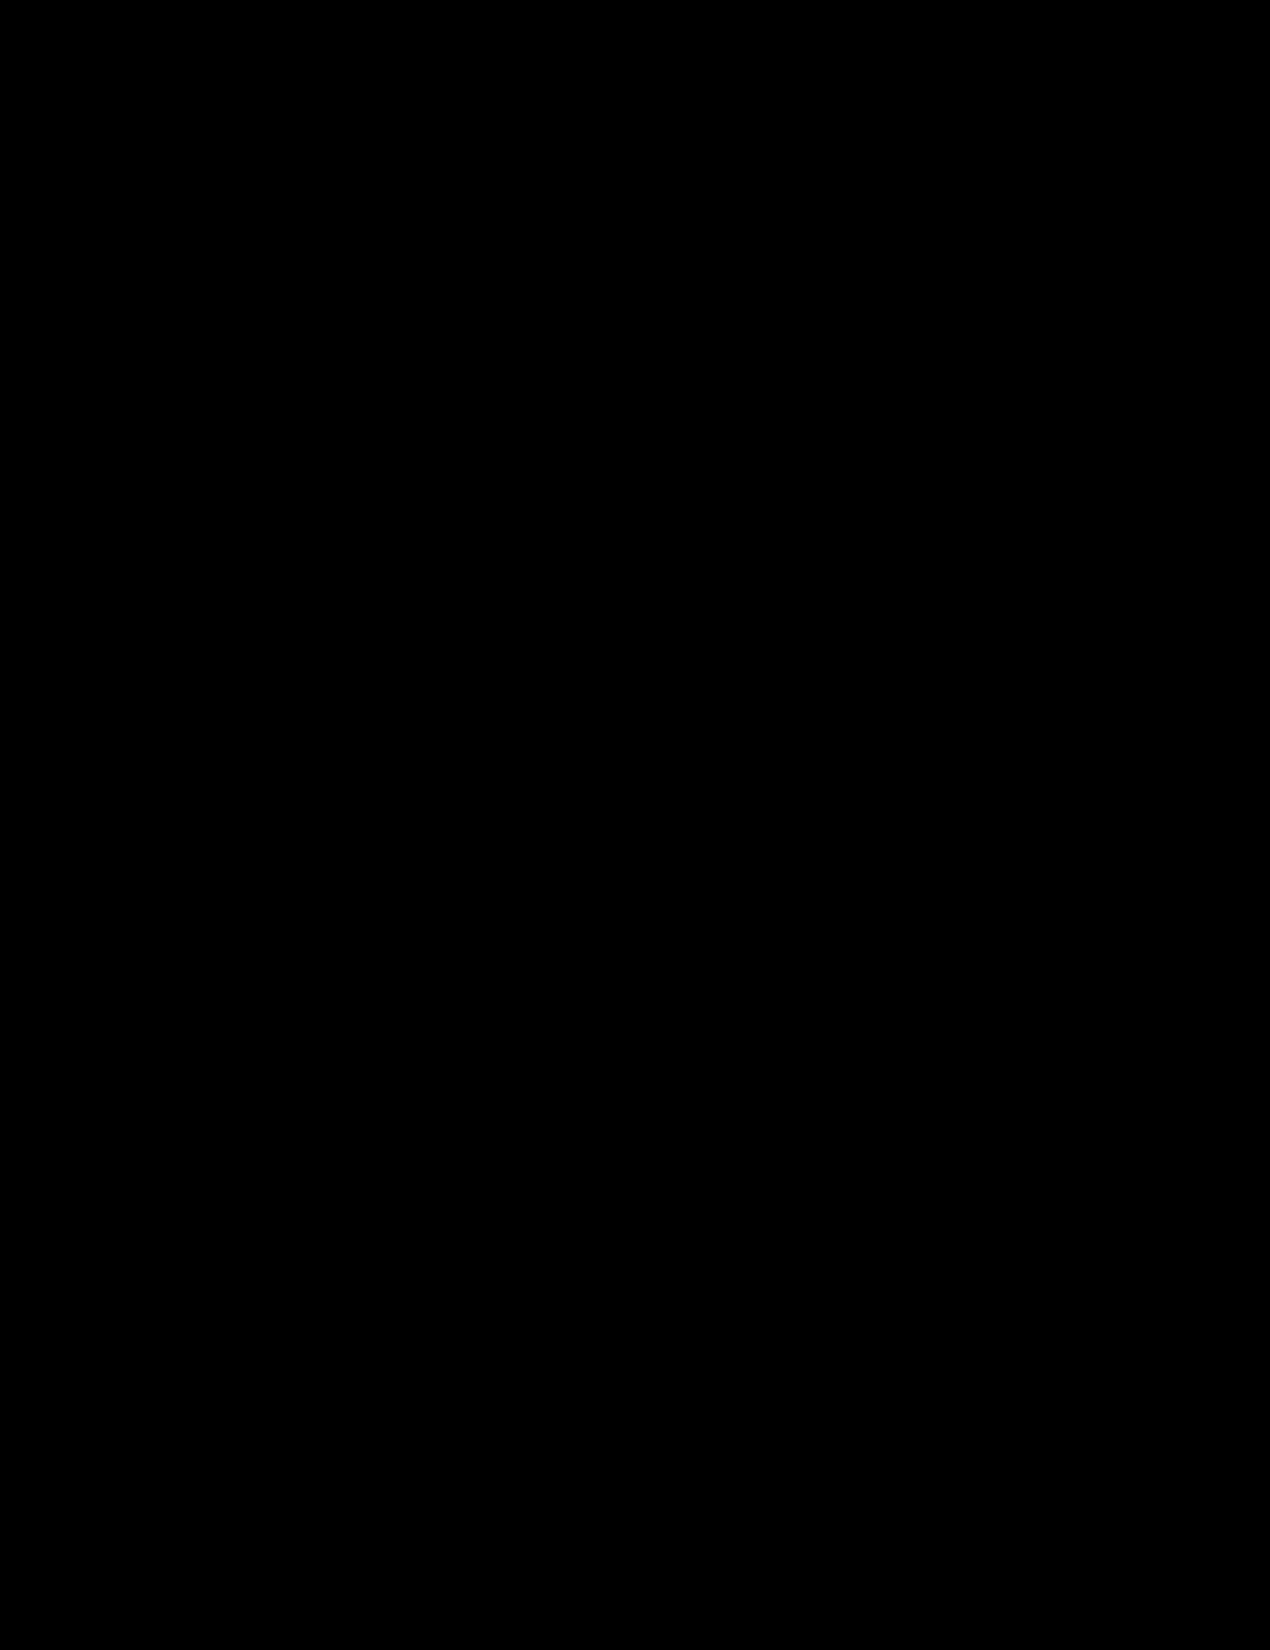 Solution architecture blueprint redbrew enterprise studypool redbrew enterprise architectureby teosayjade architecture blueprintea blue printdocument informationgeneral information document name ea blueprint malvernweather Gallery